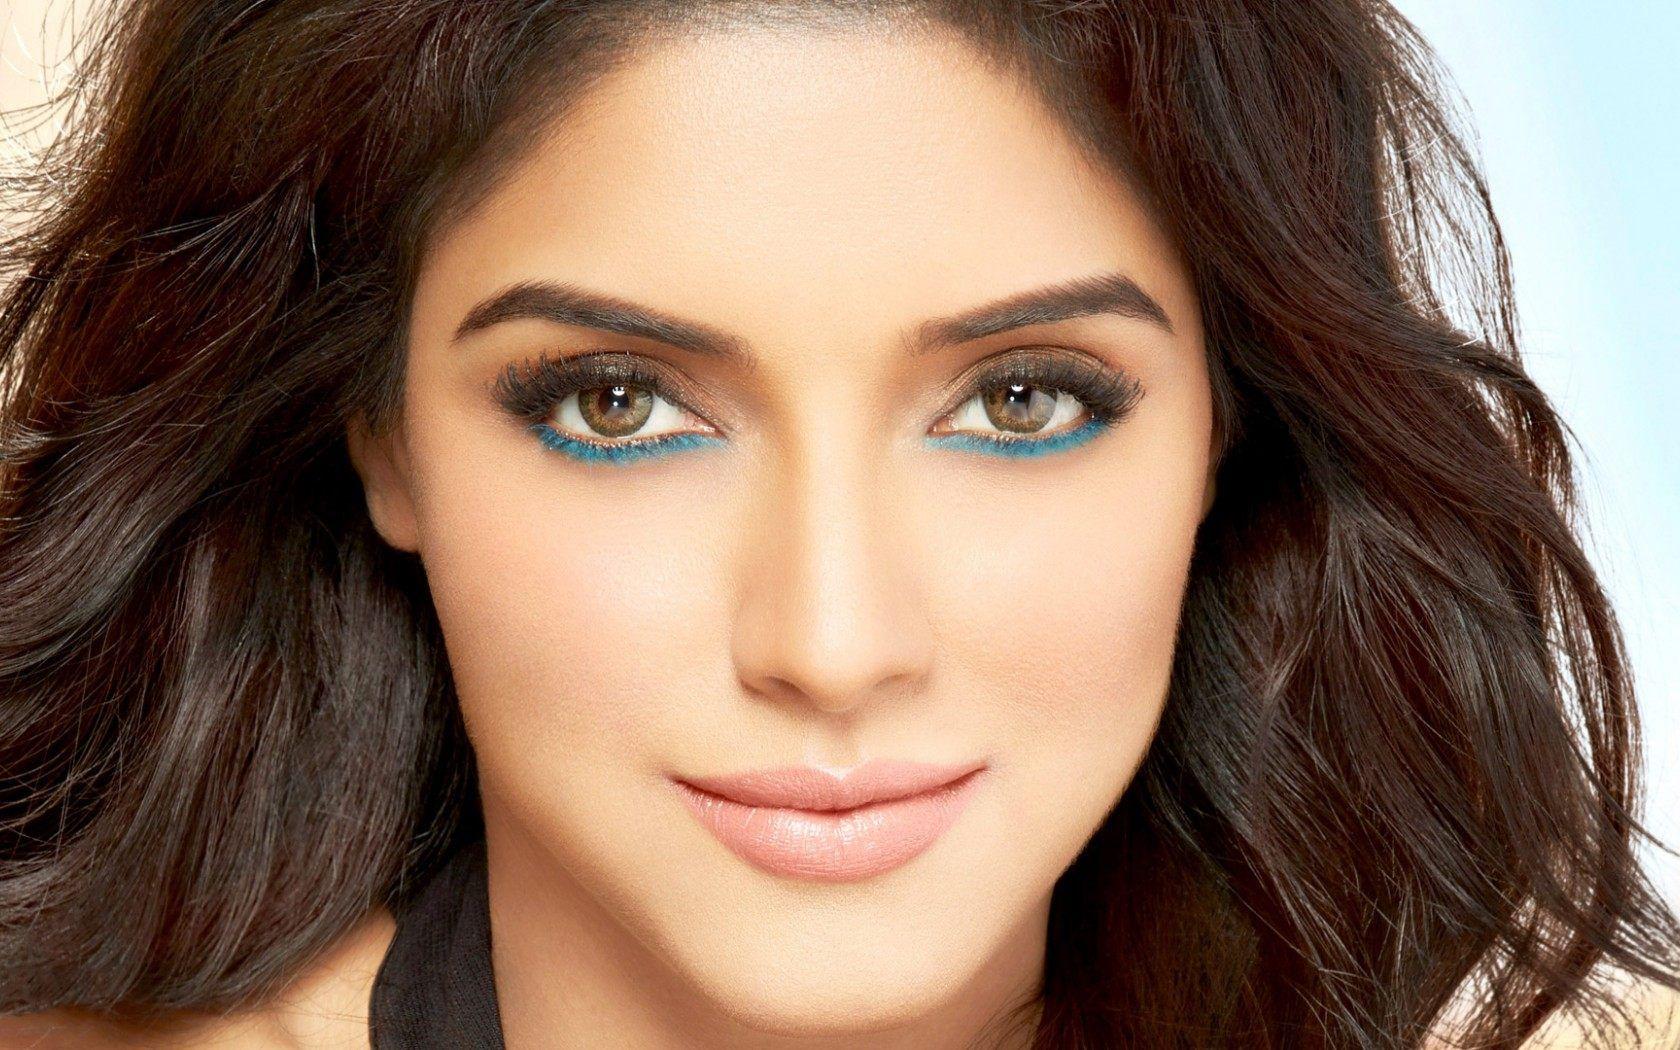 Beautiful Girl Face Hd Desktop Wallpaper Asin Photos Hd